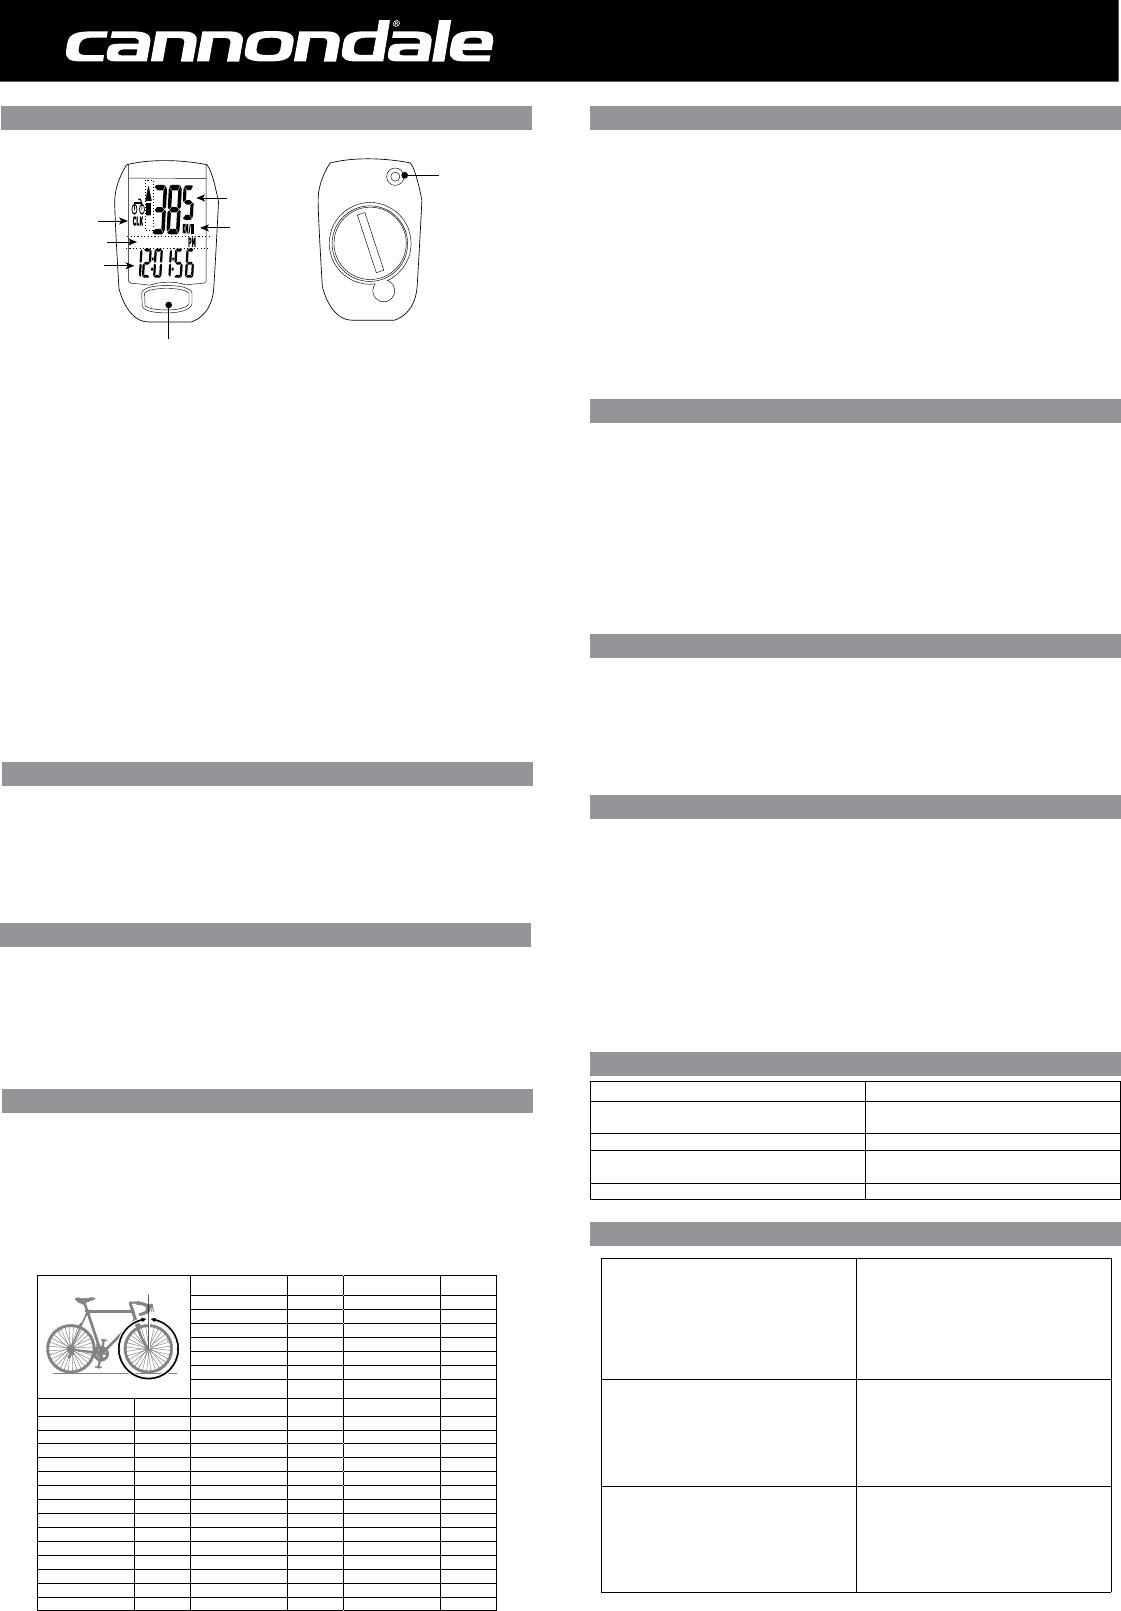 5e3d02cb4ee Handleiding Cannondale IQ200 - 2012 (pagina 1 van 4) (English)